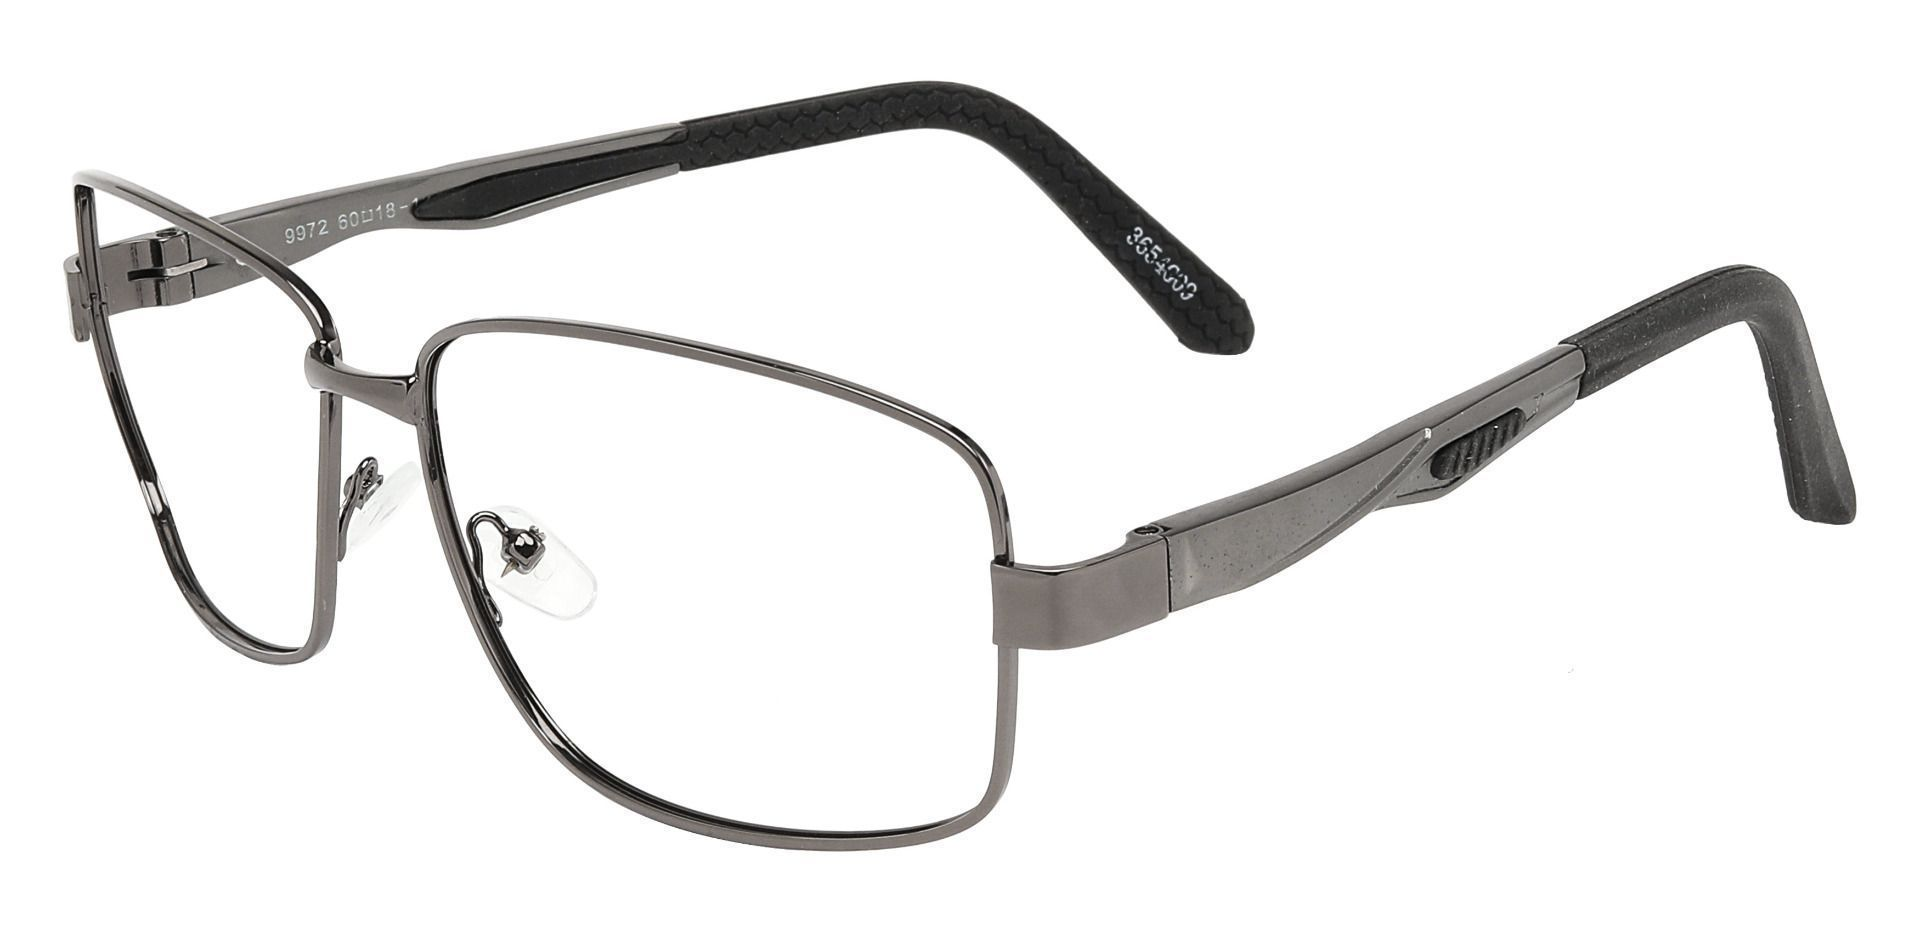 Greg Rectangle Single Vision Glasses - Gray